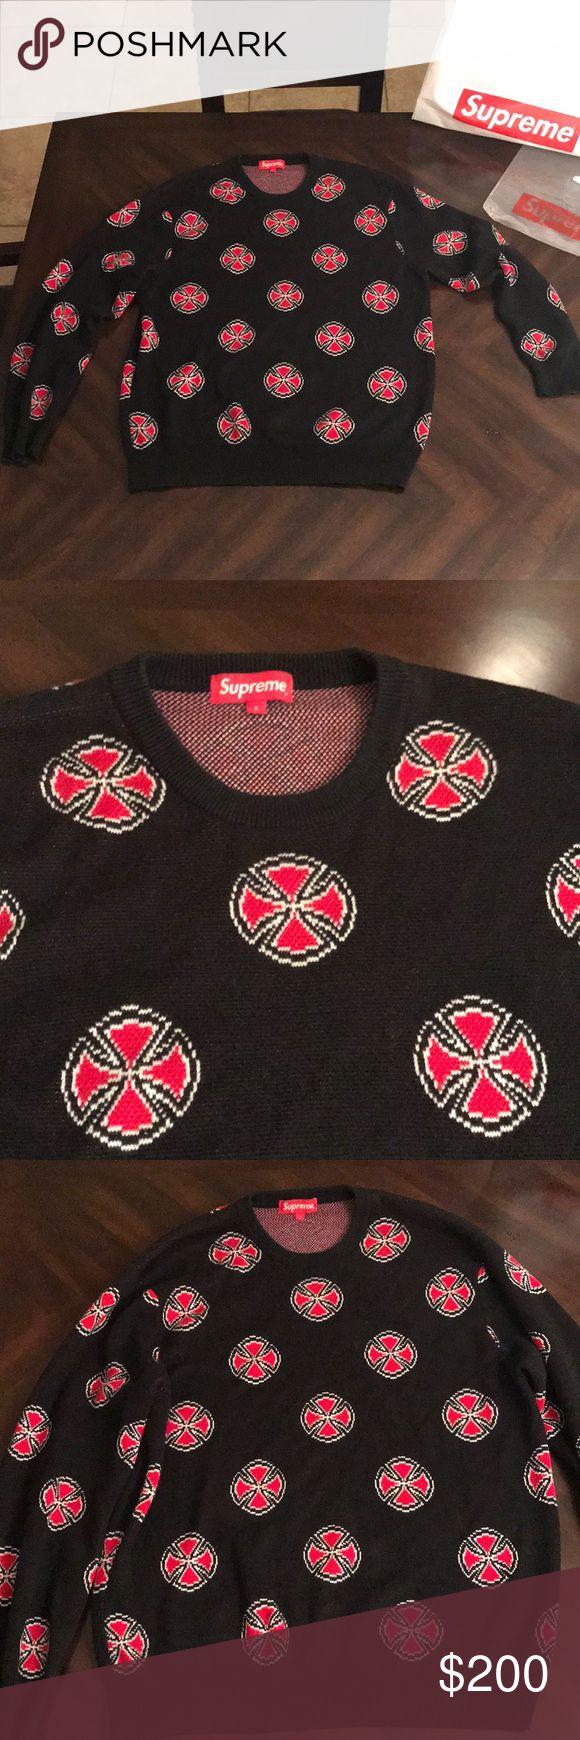 Men's size Large Supreme sweater Men's size Large Supreme independent crosses sweater Supreme Sweaters Crewneck